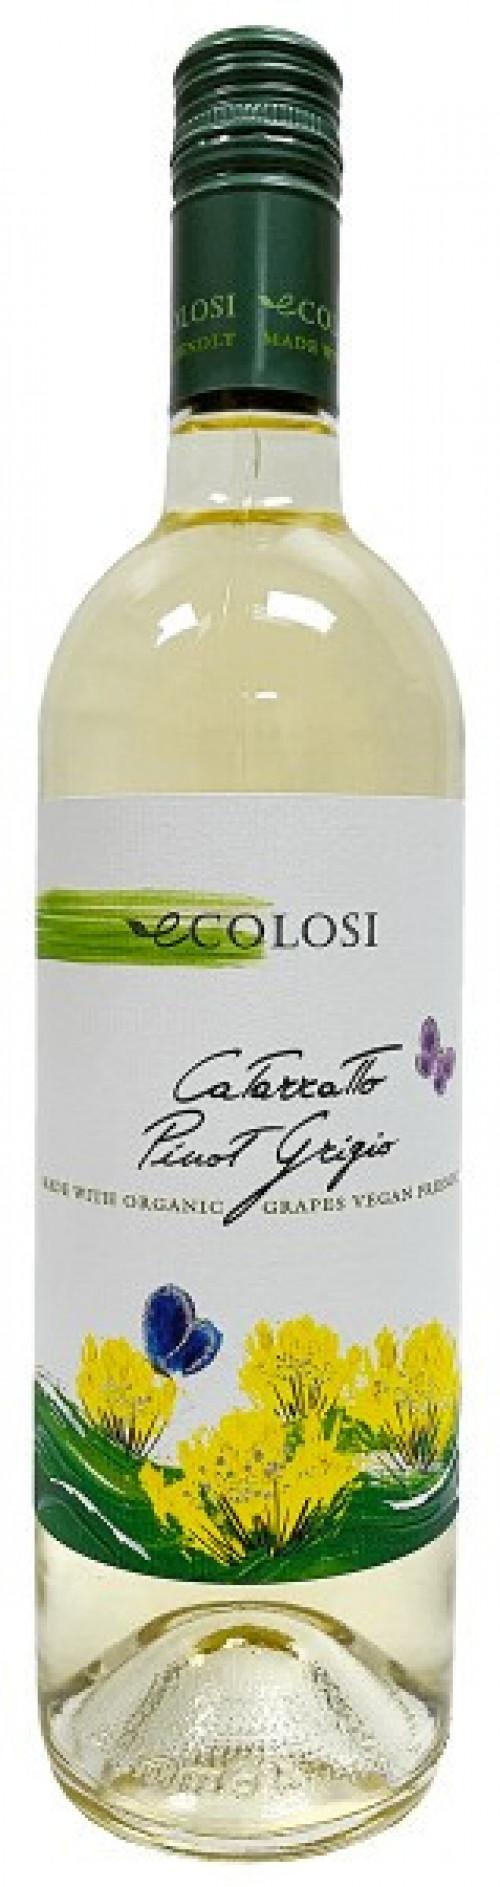 Ecolosi Pinot Grigio 750ml